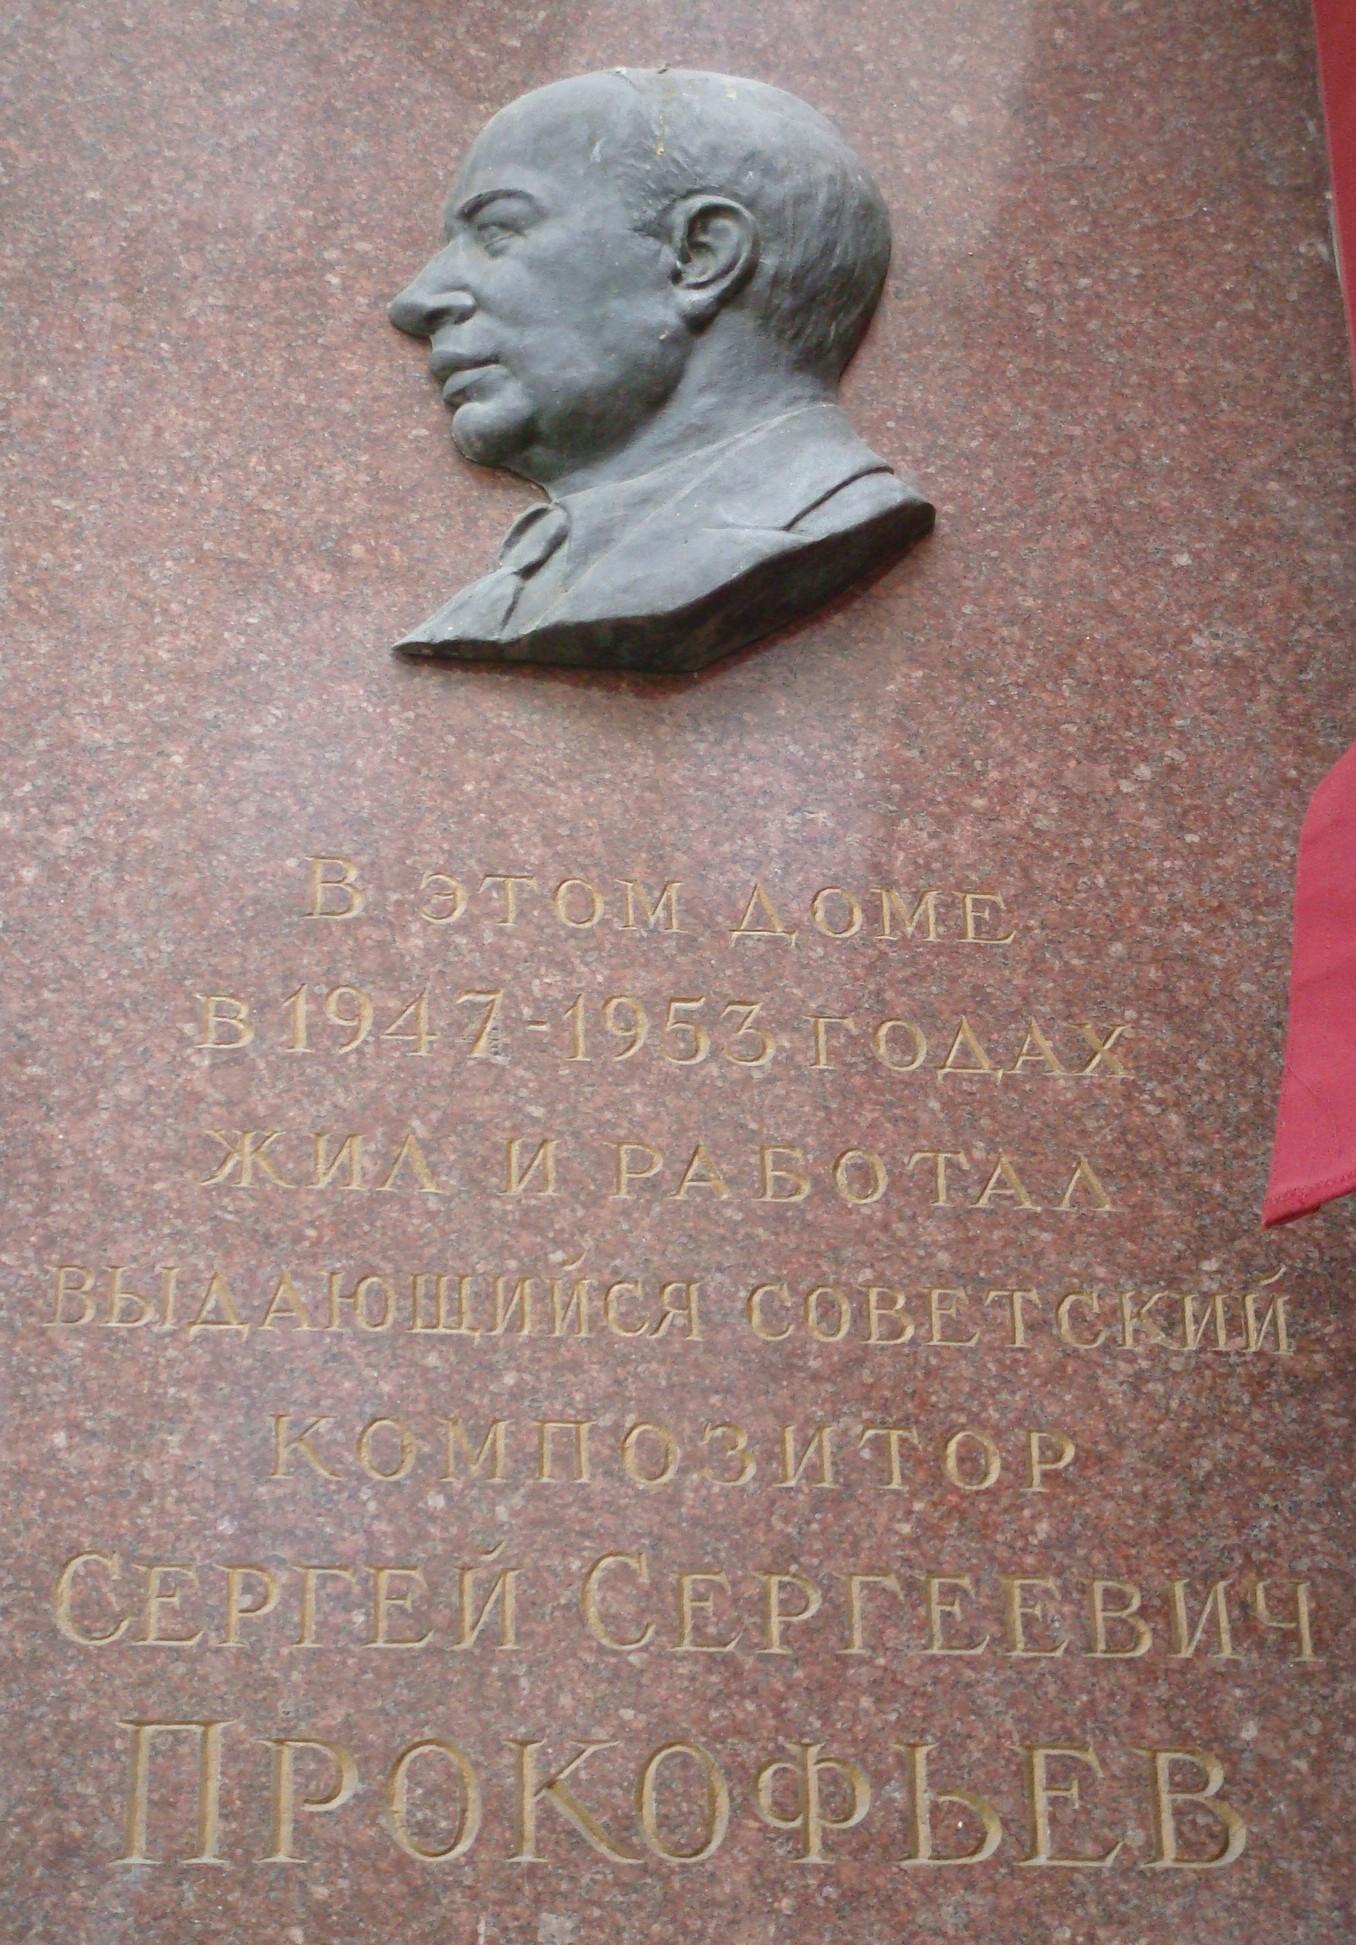 Prokofiev memorial plaque